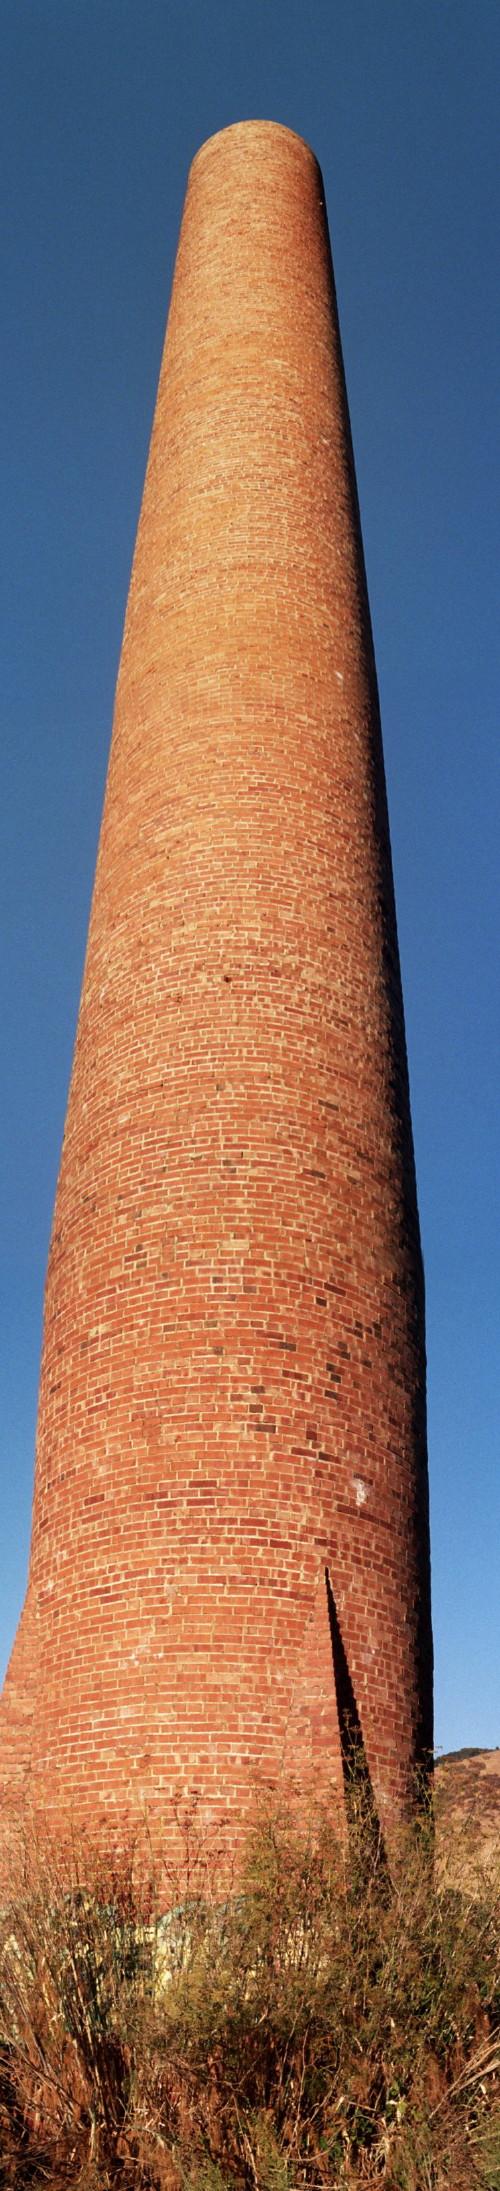 chimney2_1.jpg